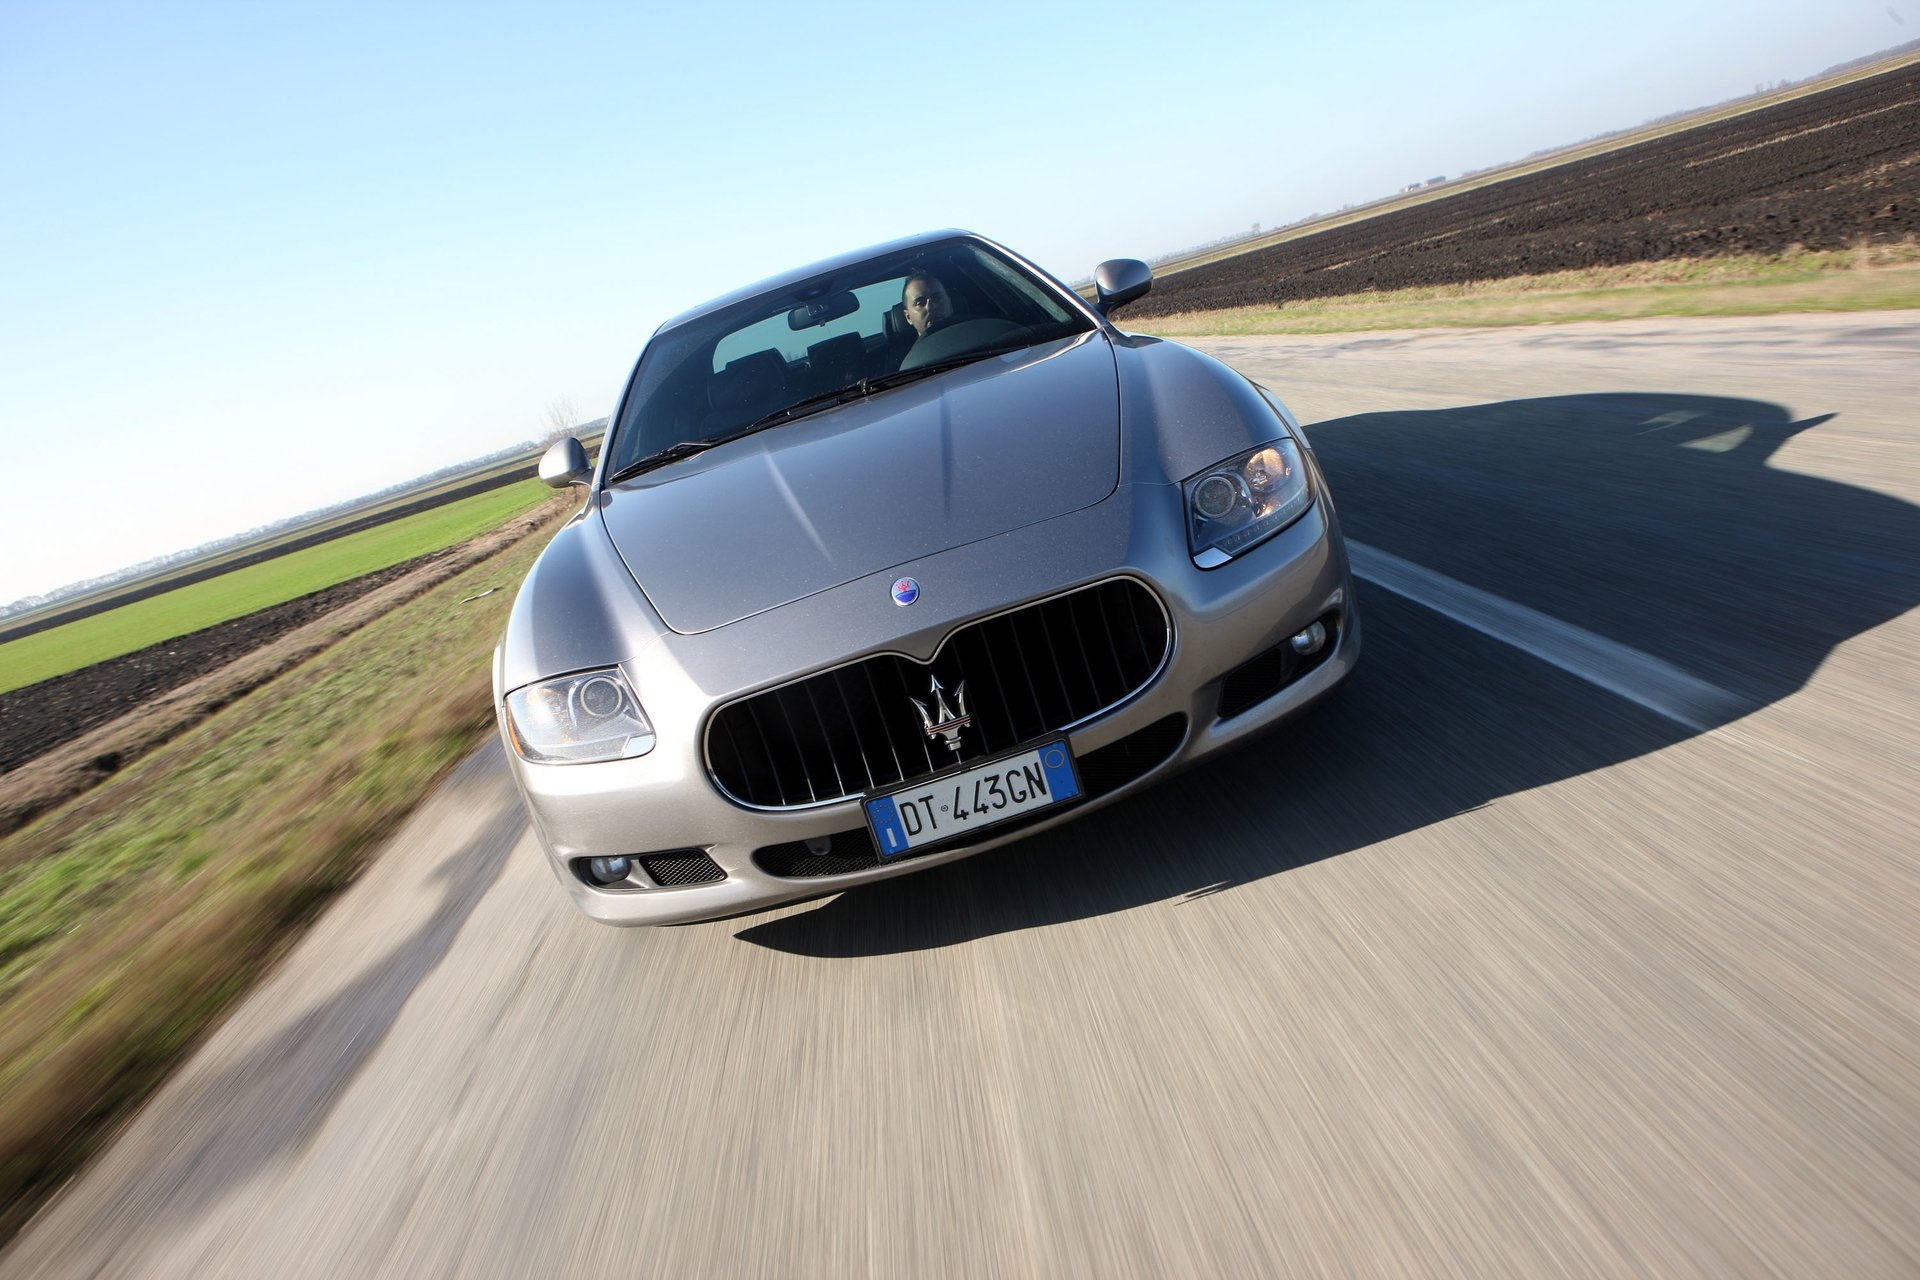 which car depreciates the most?